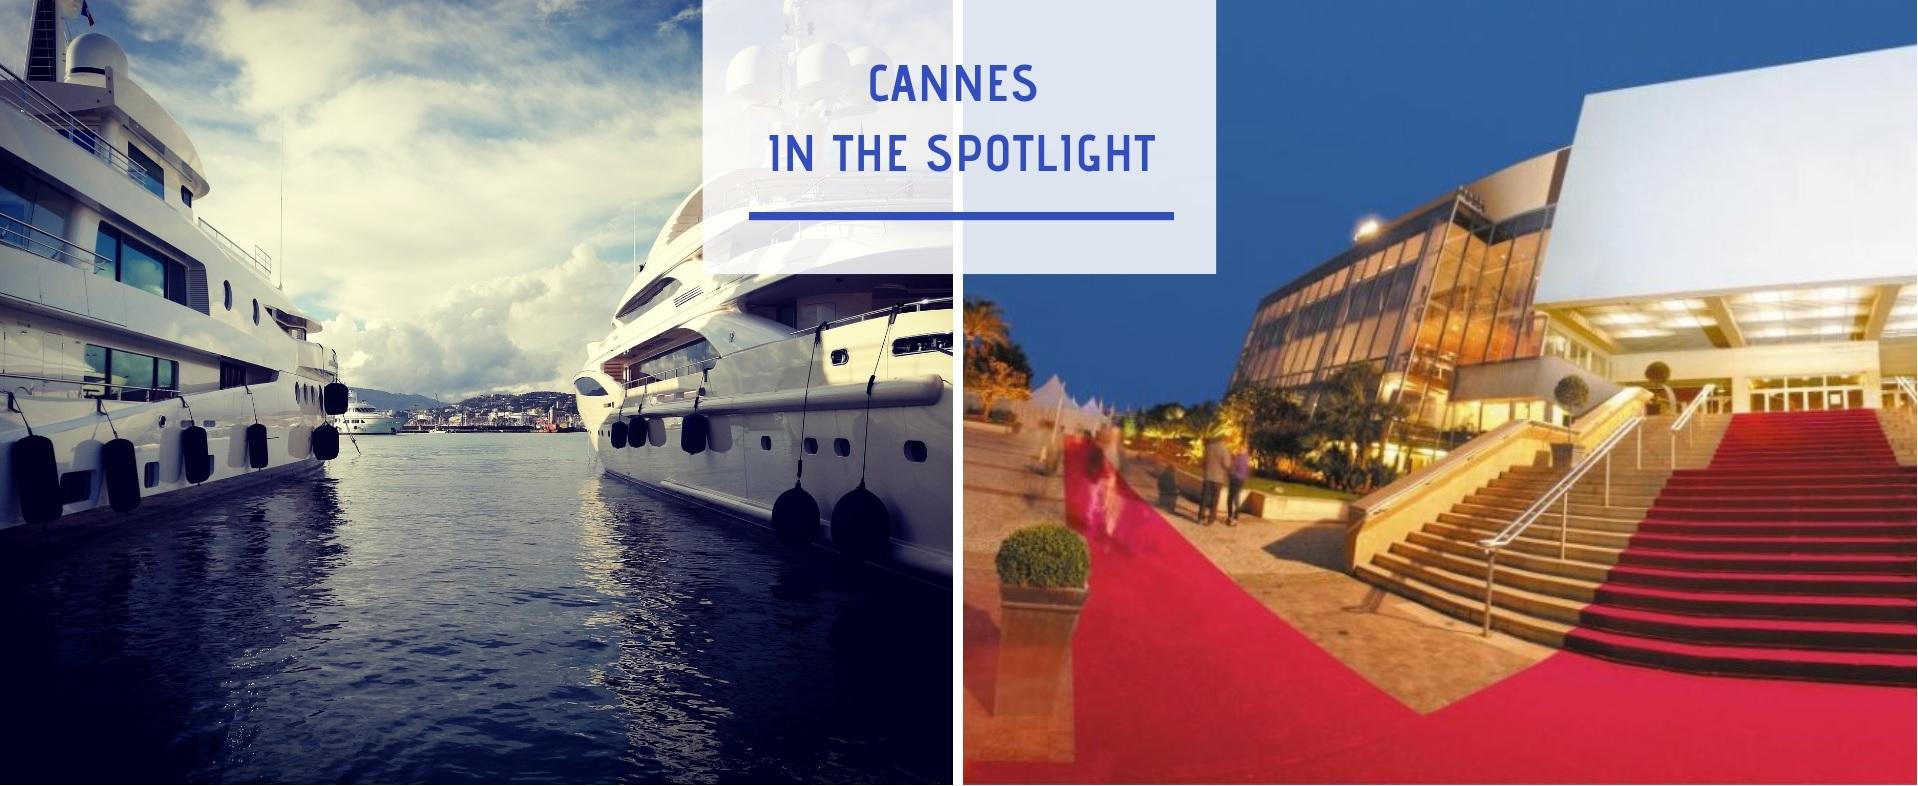 Cannes anglais